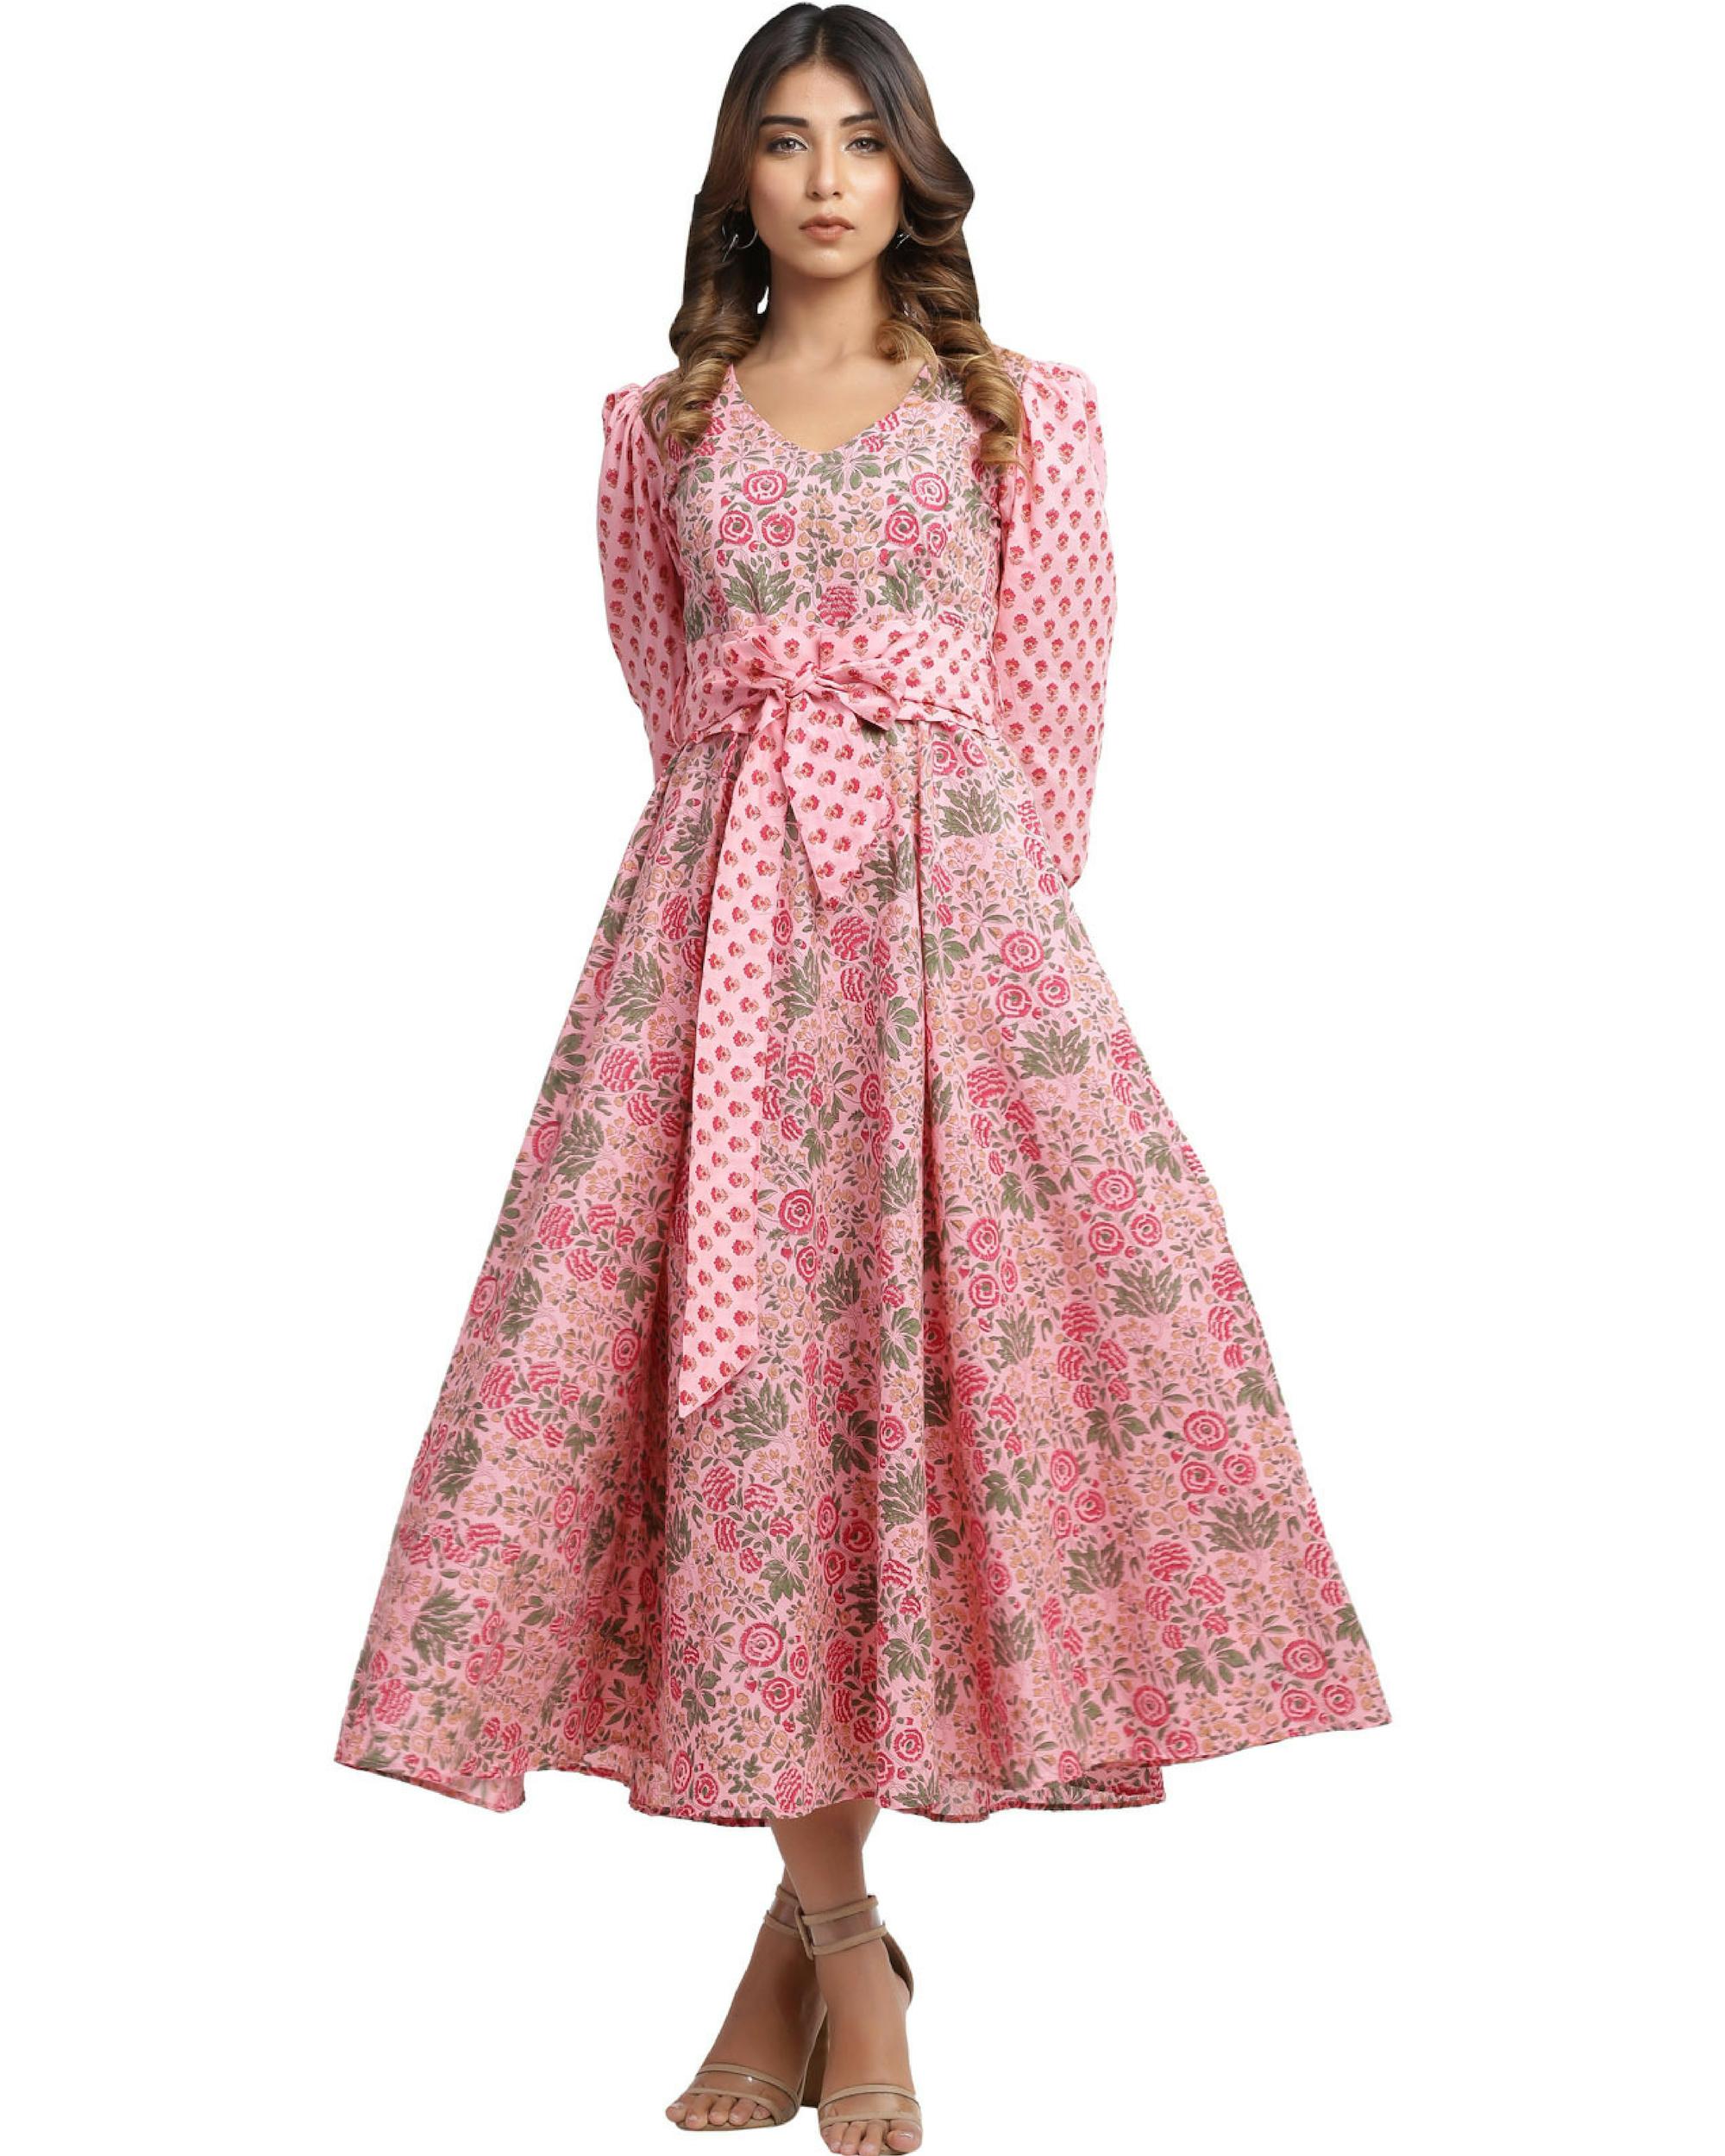 Pure cotton flamingo pink dress